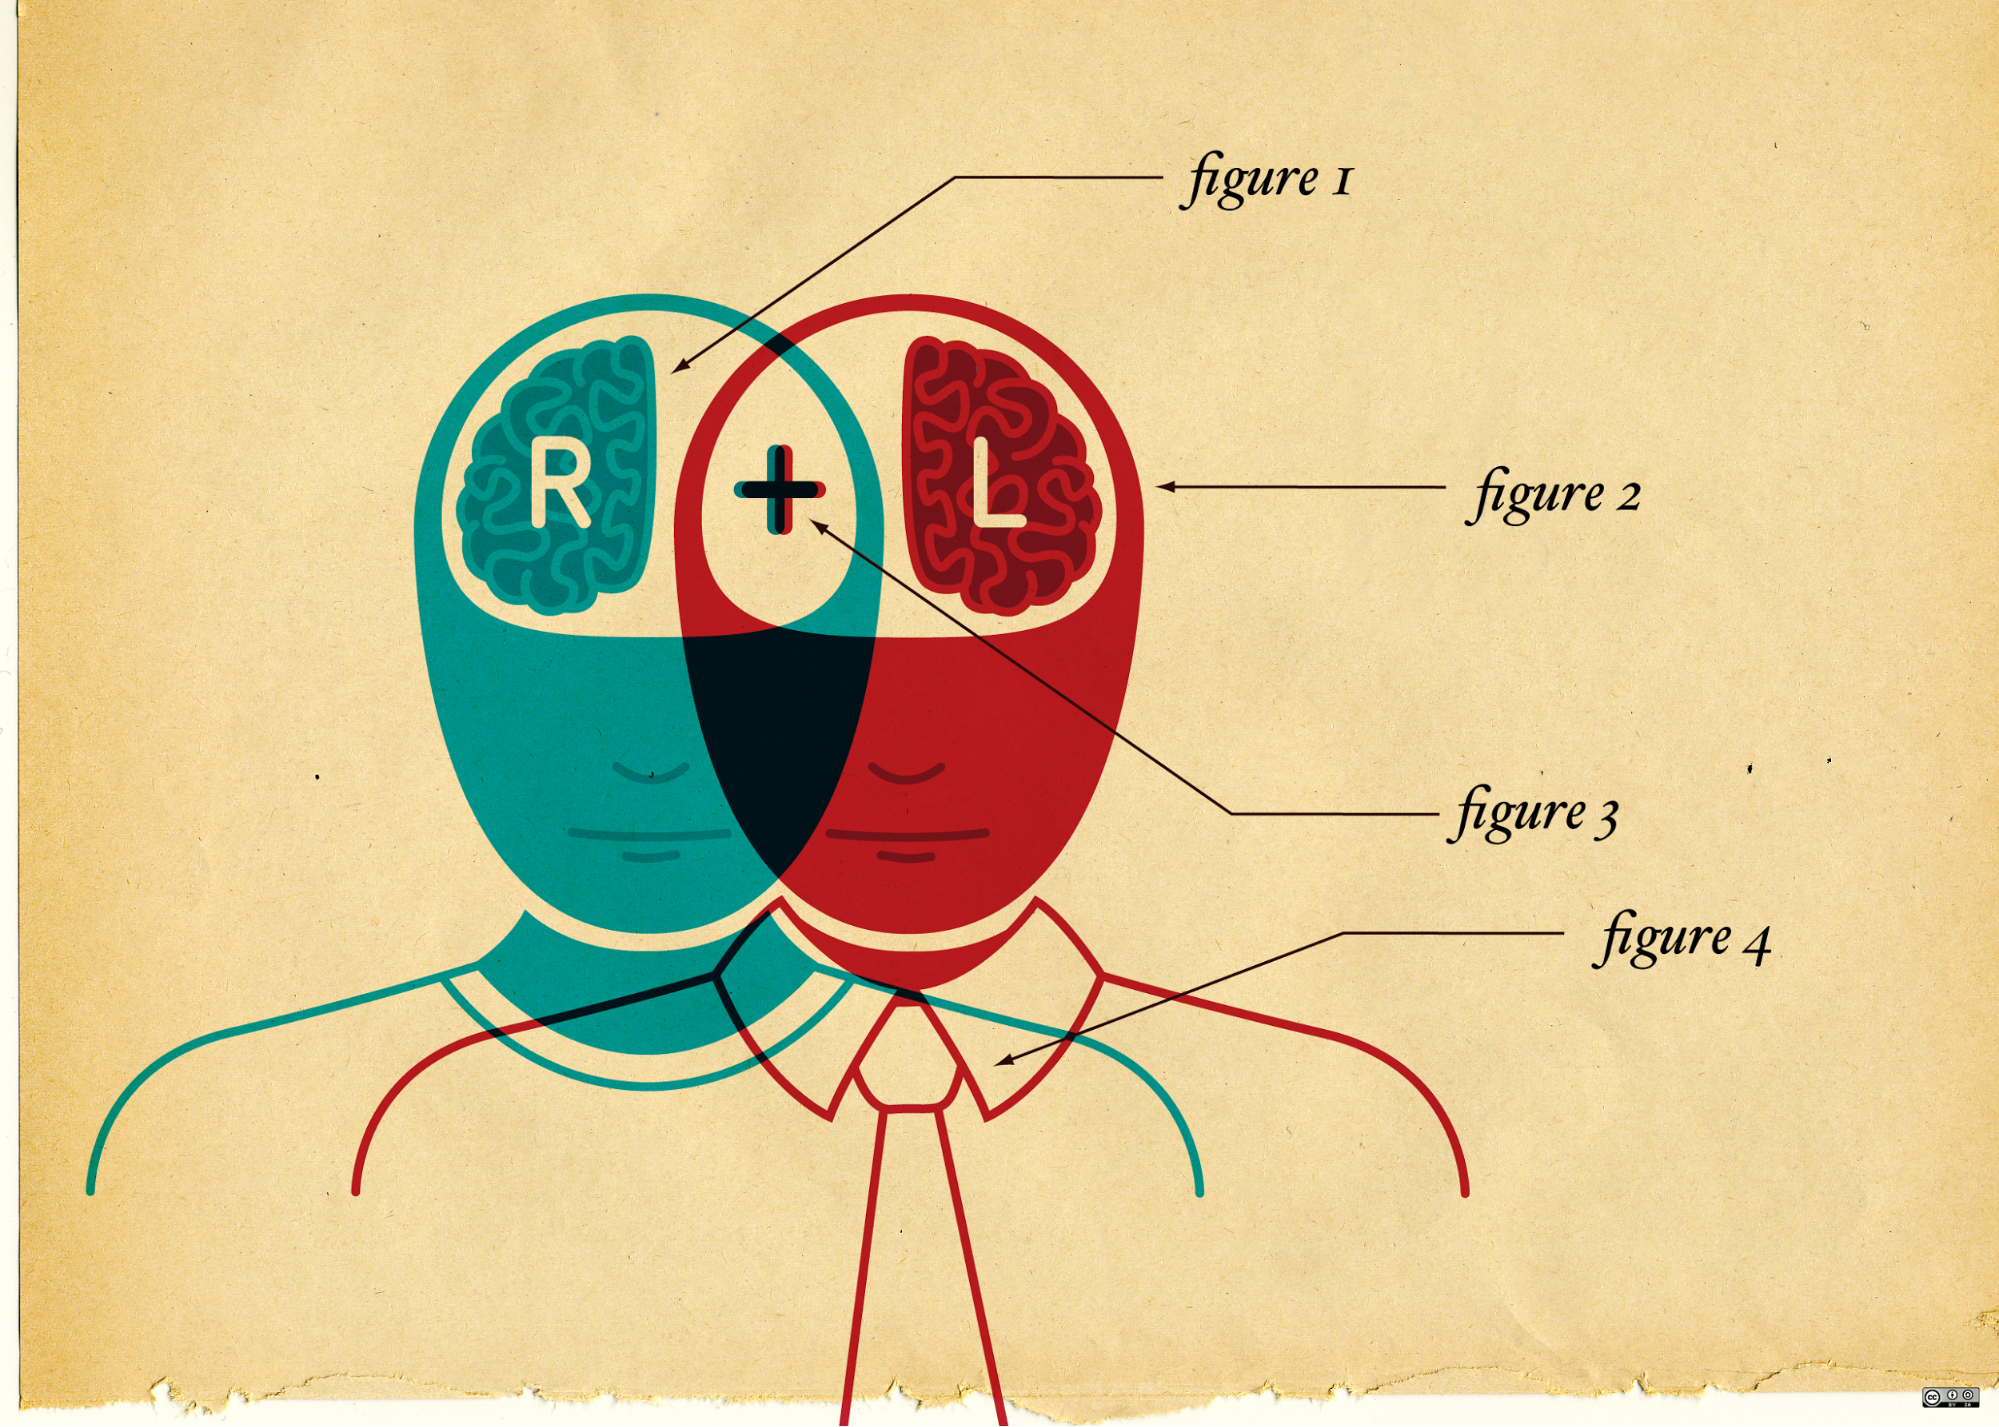 Venn diagram of left and right brains overlapping